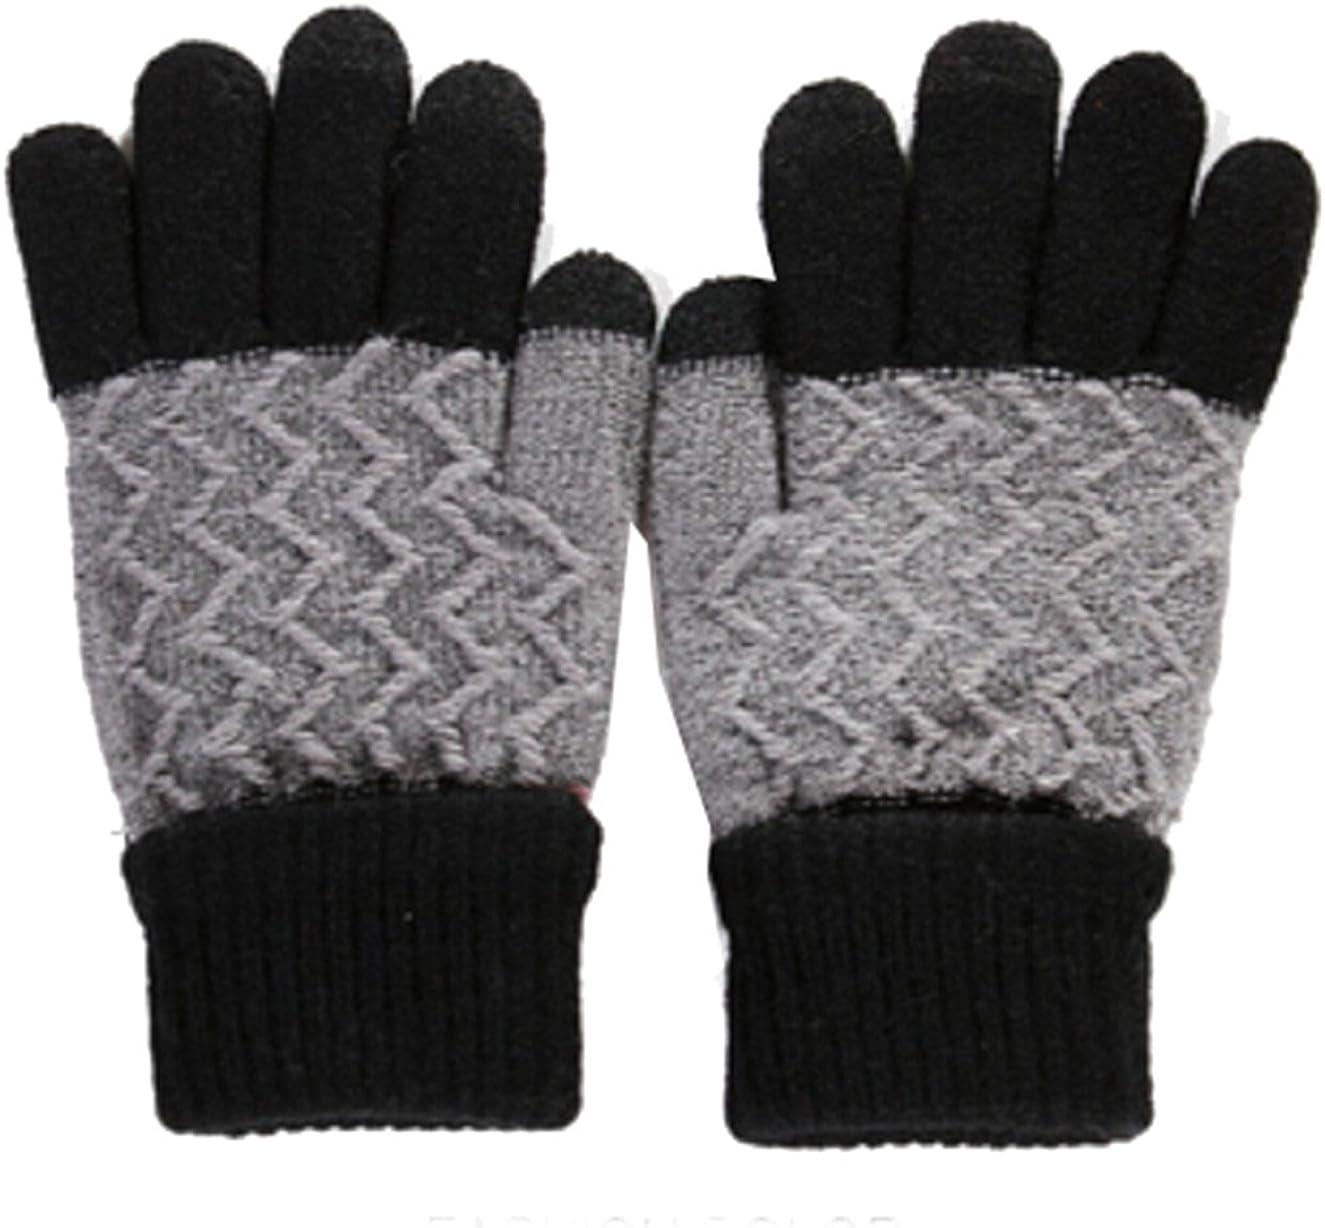 Km Unisex Adult Winter Warm Knit Touchscreen Gloves